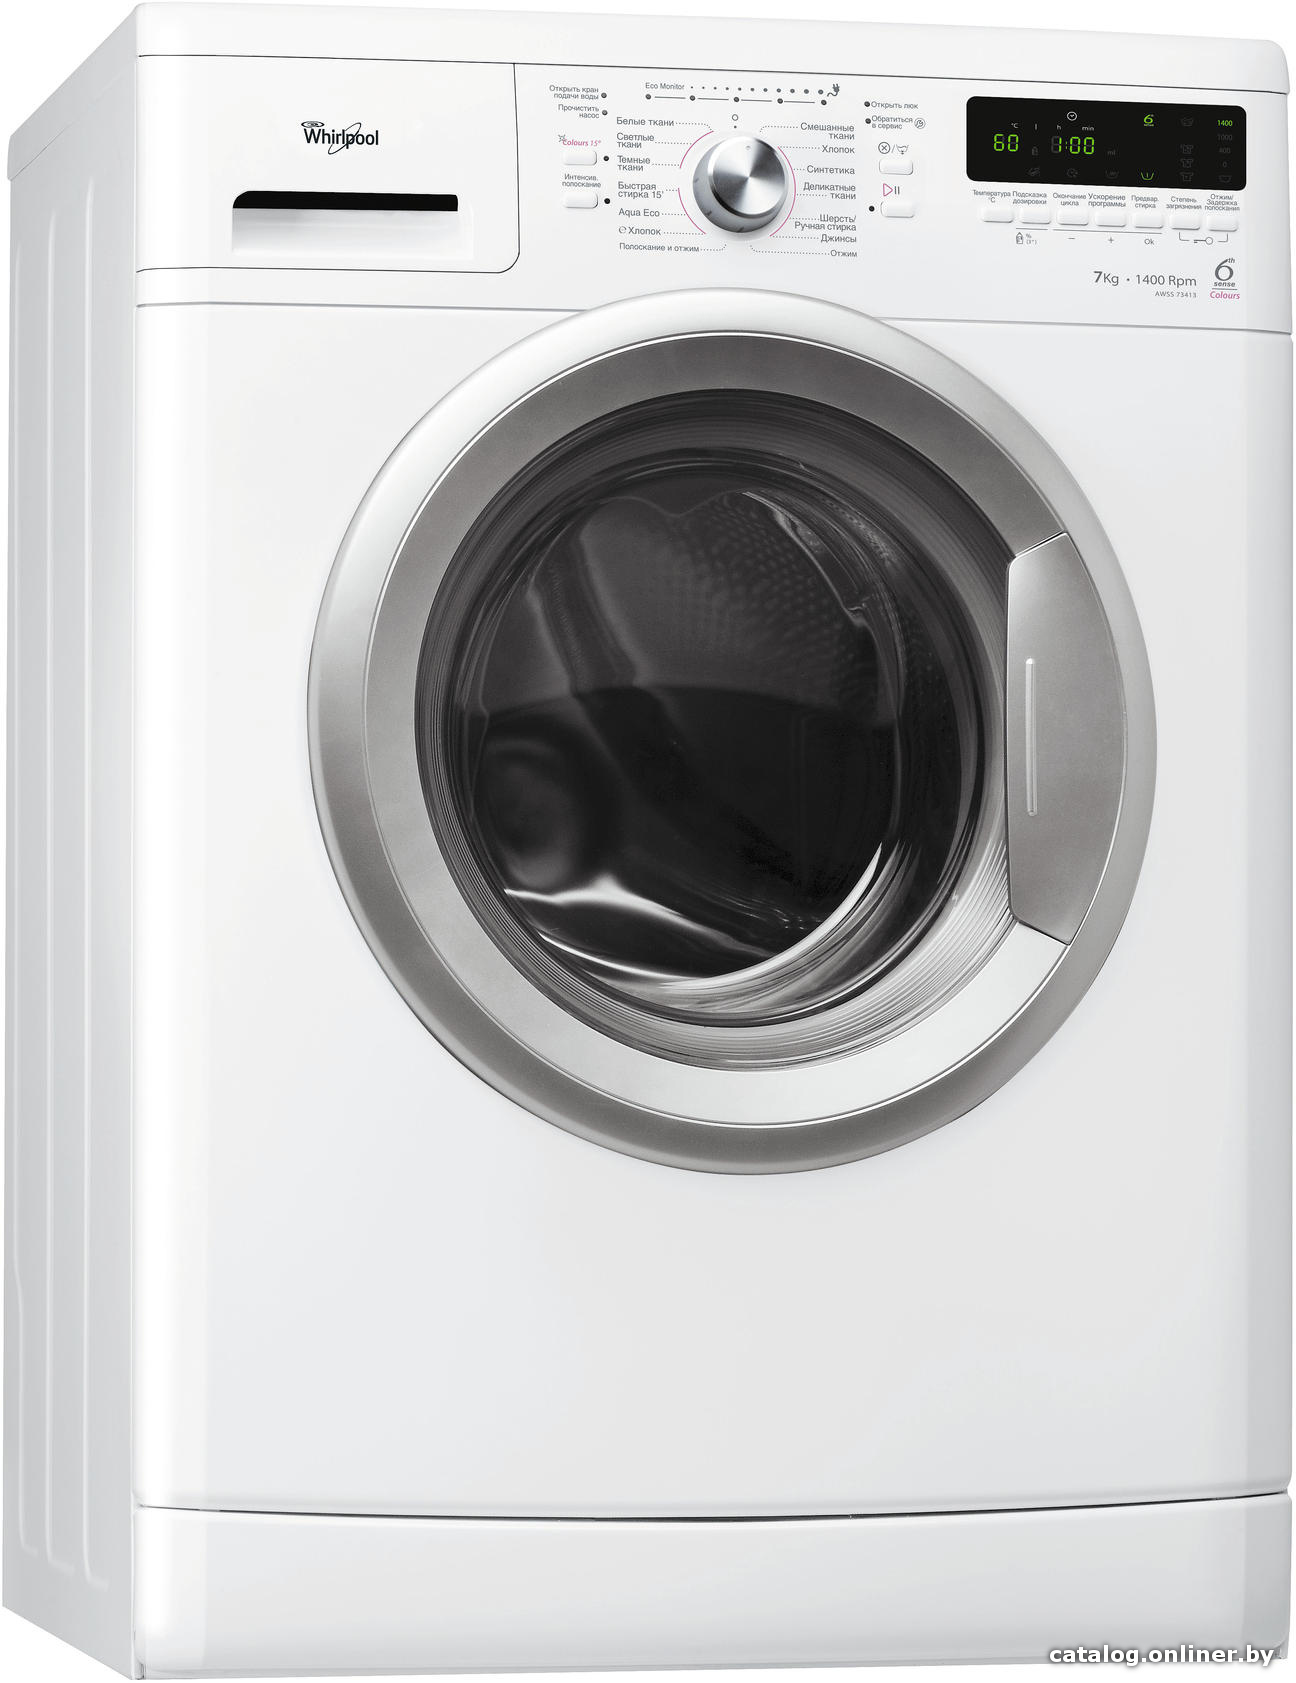 whirlpool awm 245-600 инструкция